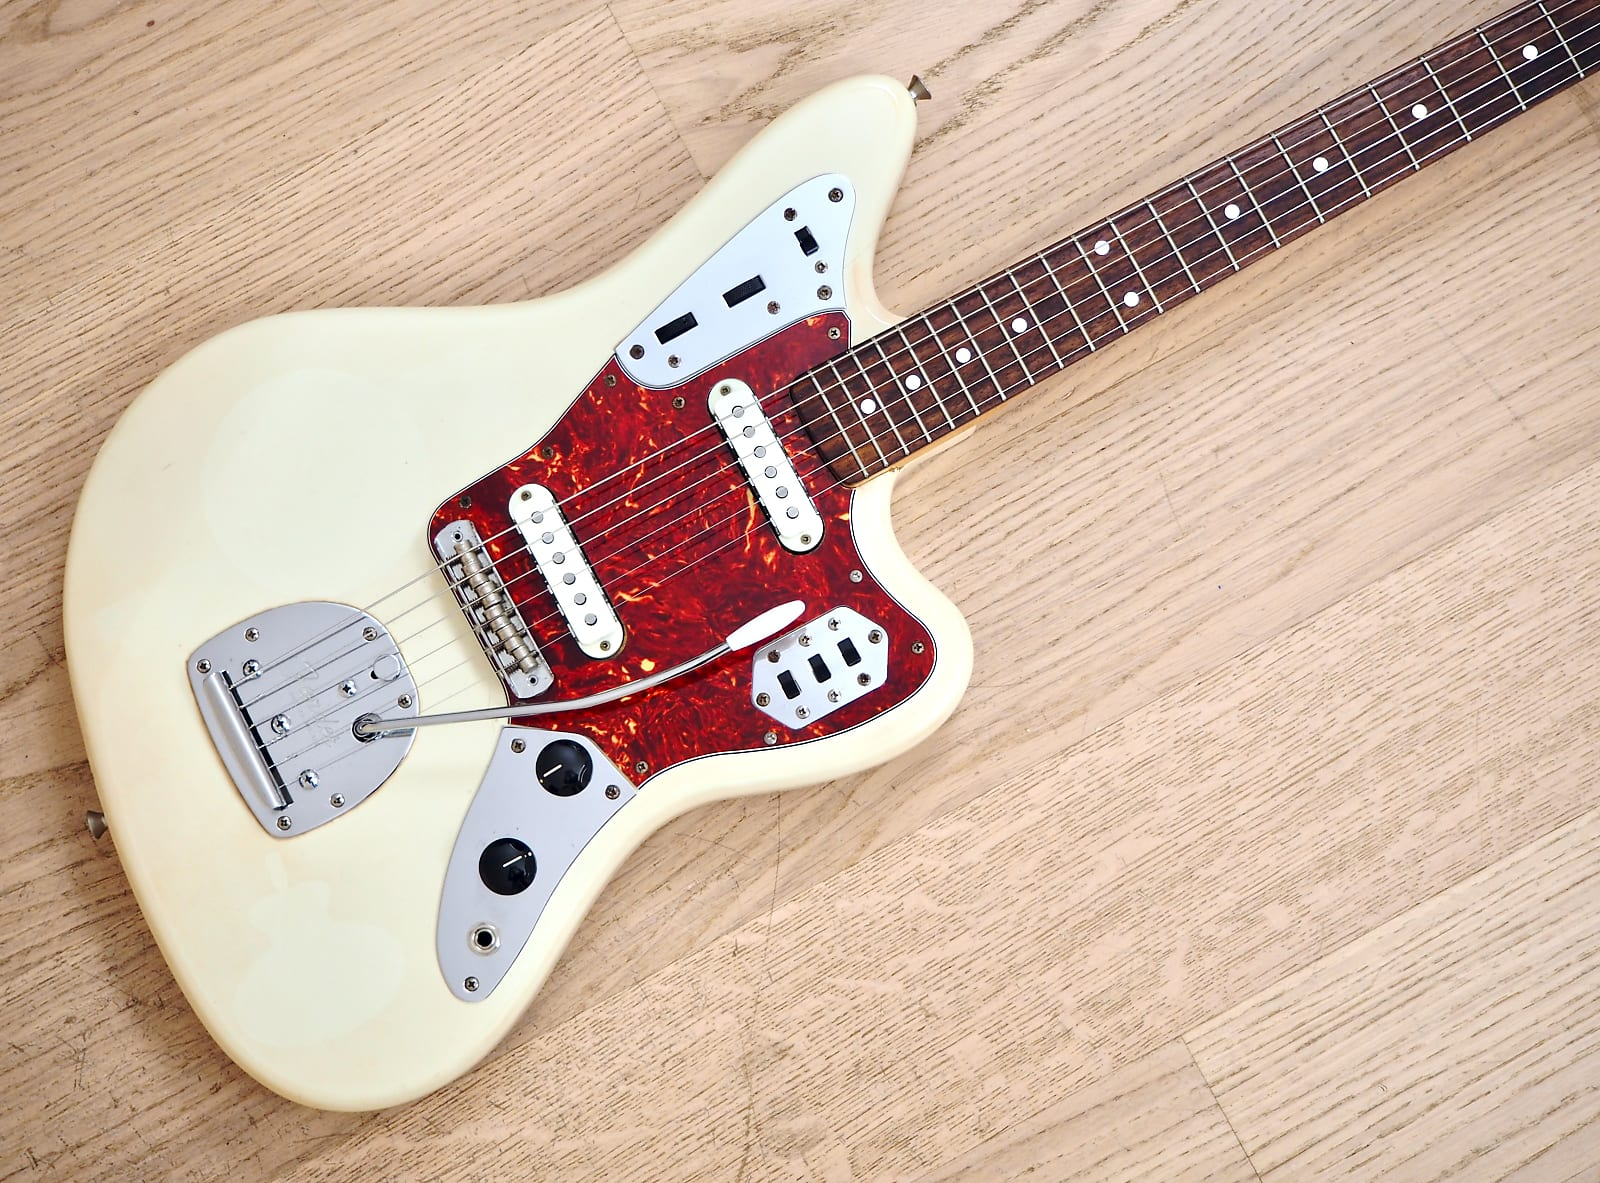 1996 Fender Jaguar '62 Vintage Reissue Olympic White w/ USA Pickups &  Harness, Japan CIJMike & Mike's Guitar Bar